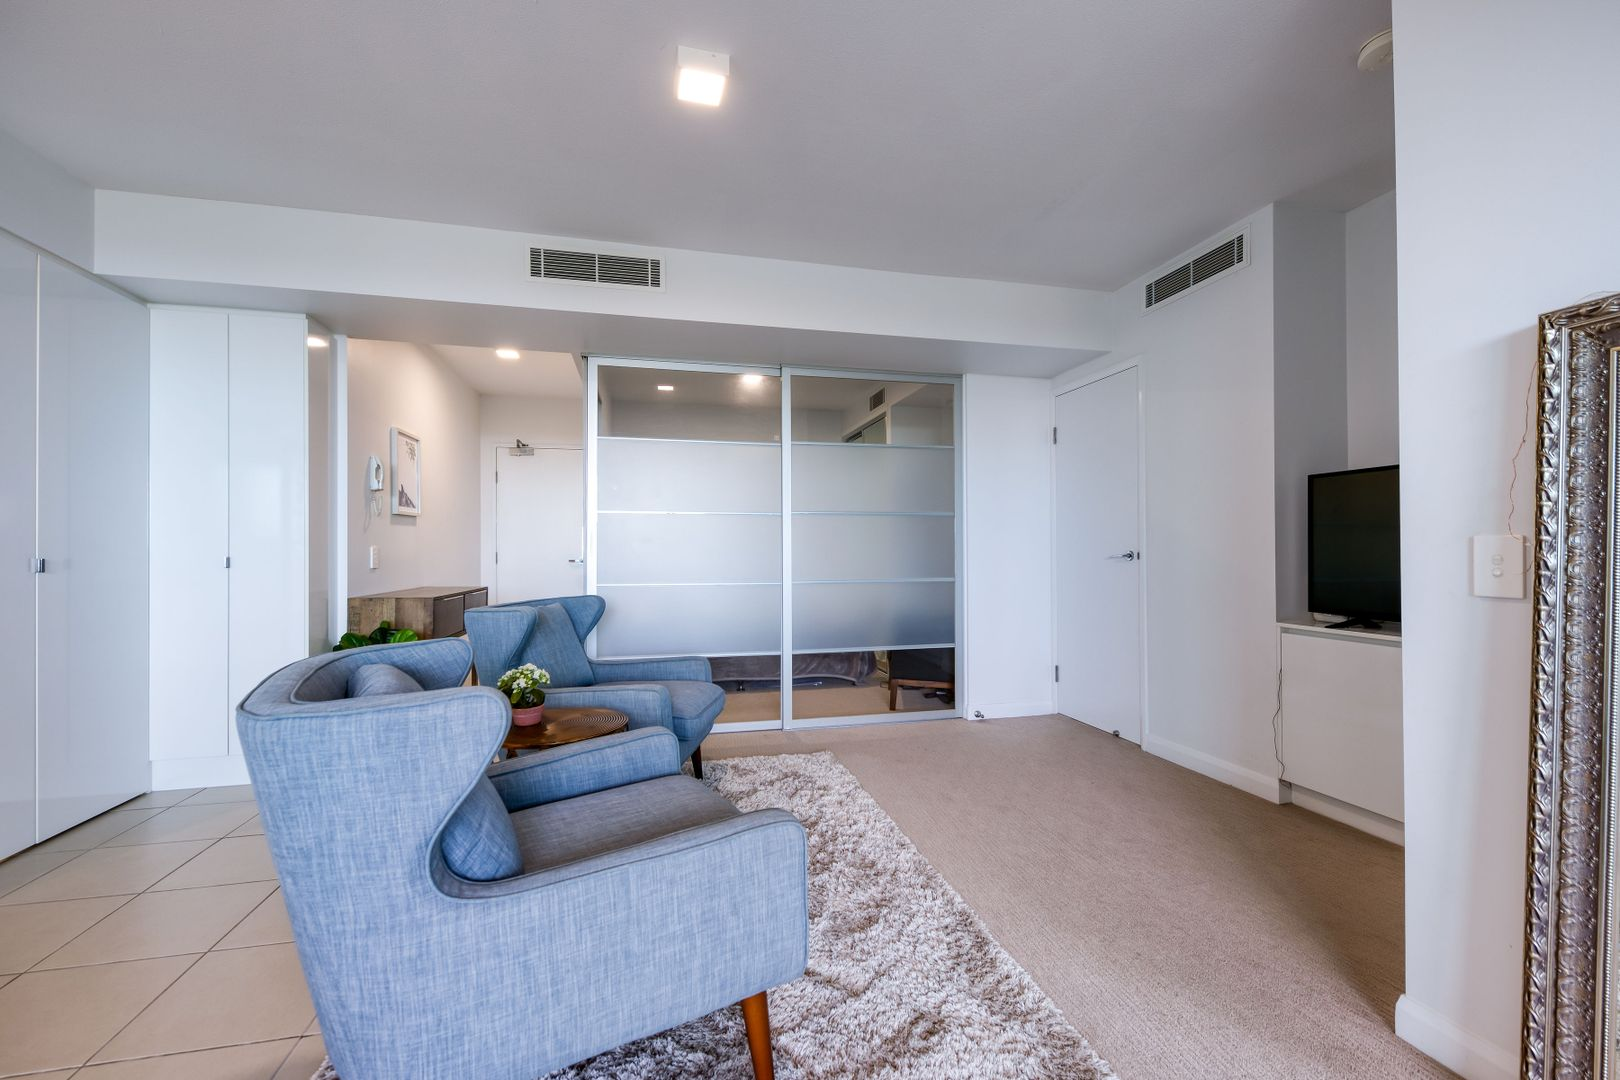 403/21 Douglas Street, Mooloolaba QLD 4557, Image 0